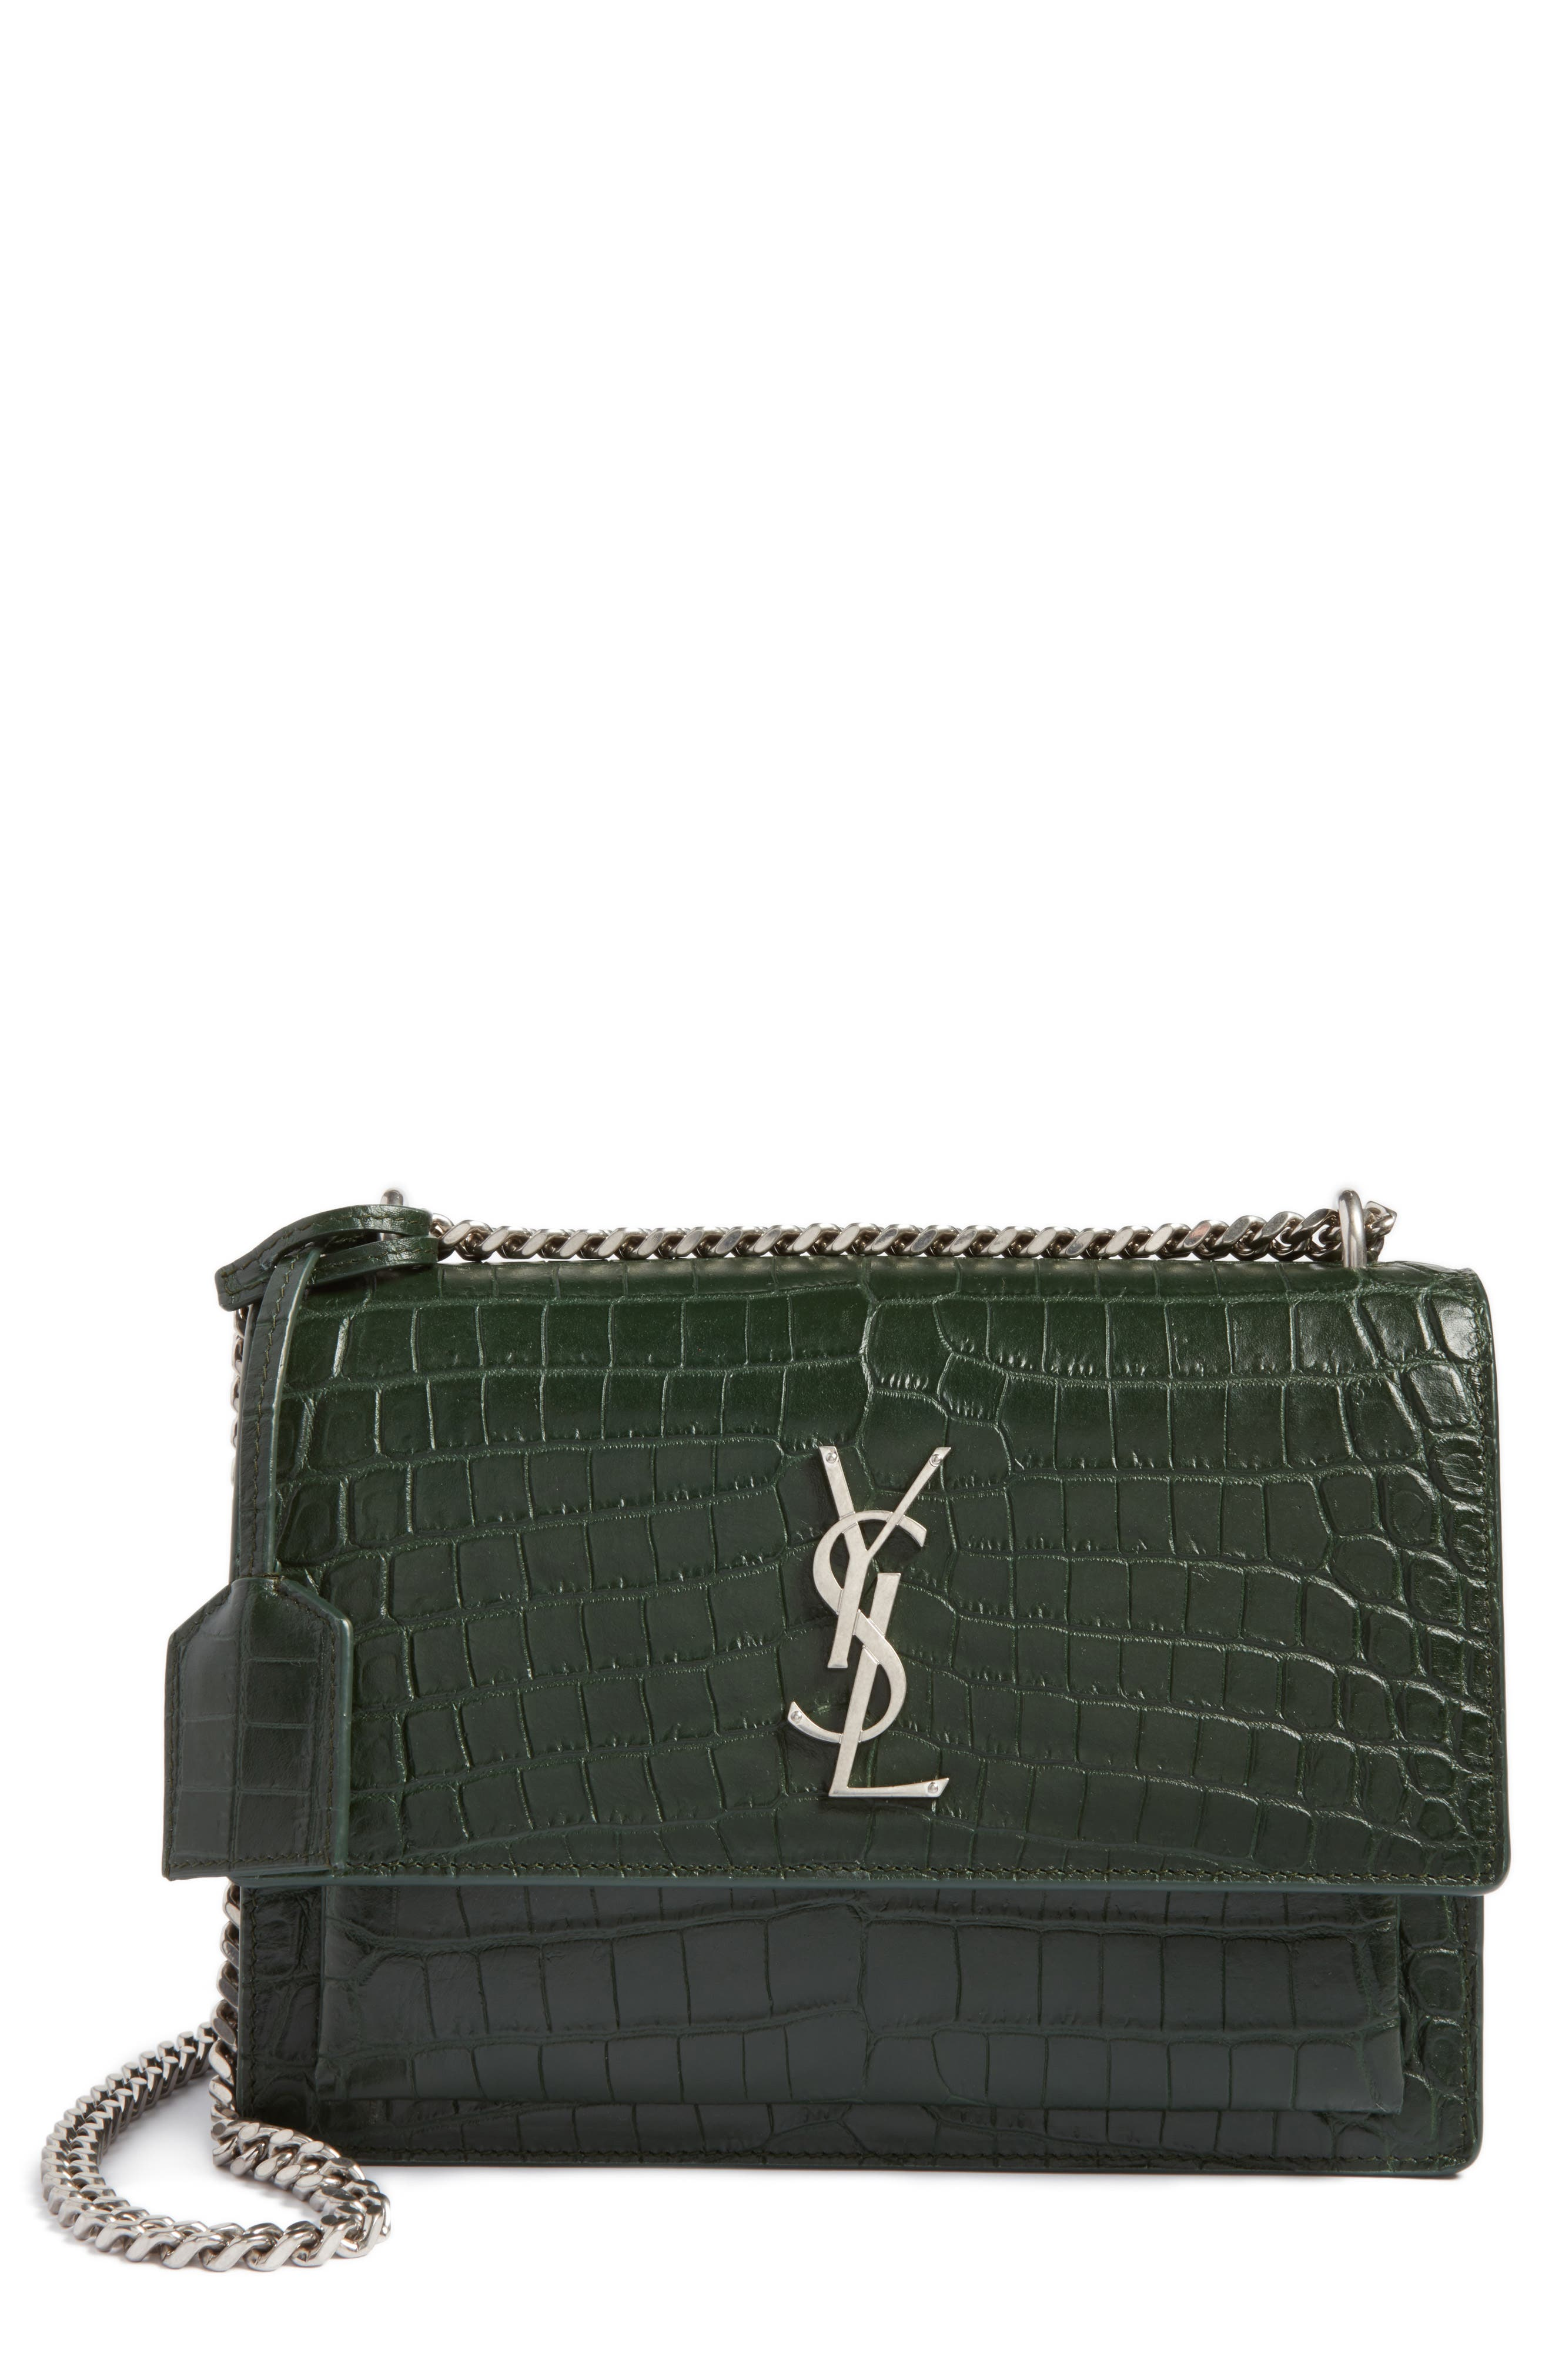 Saint Laurent Medium Sunset Croc Embossed Leather Shoulder Bag